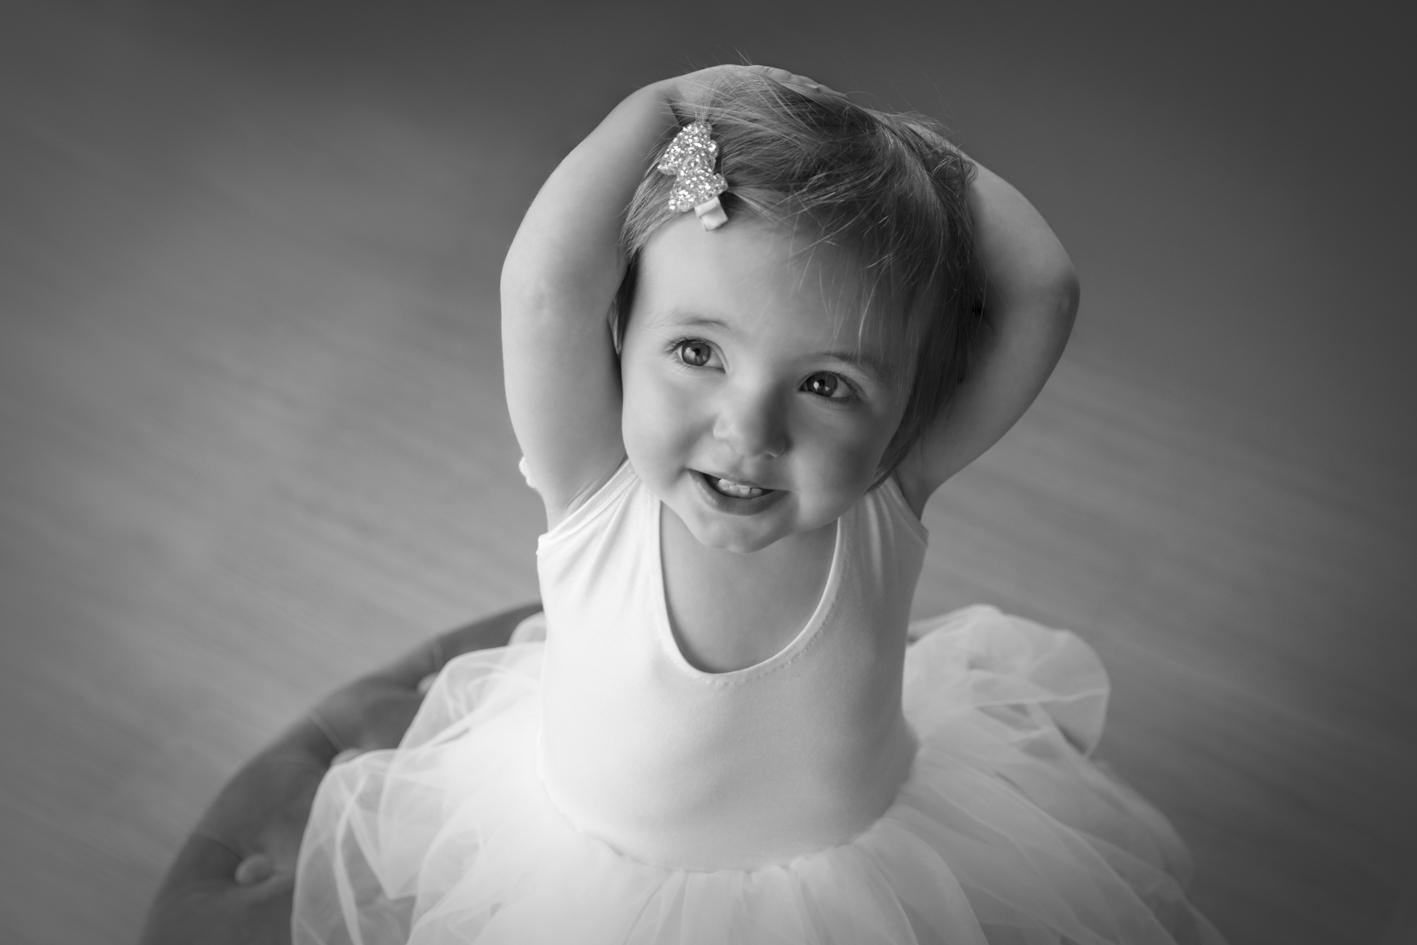 cute girl in ballerina dress